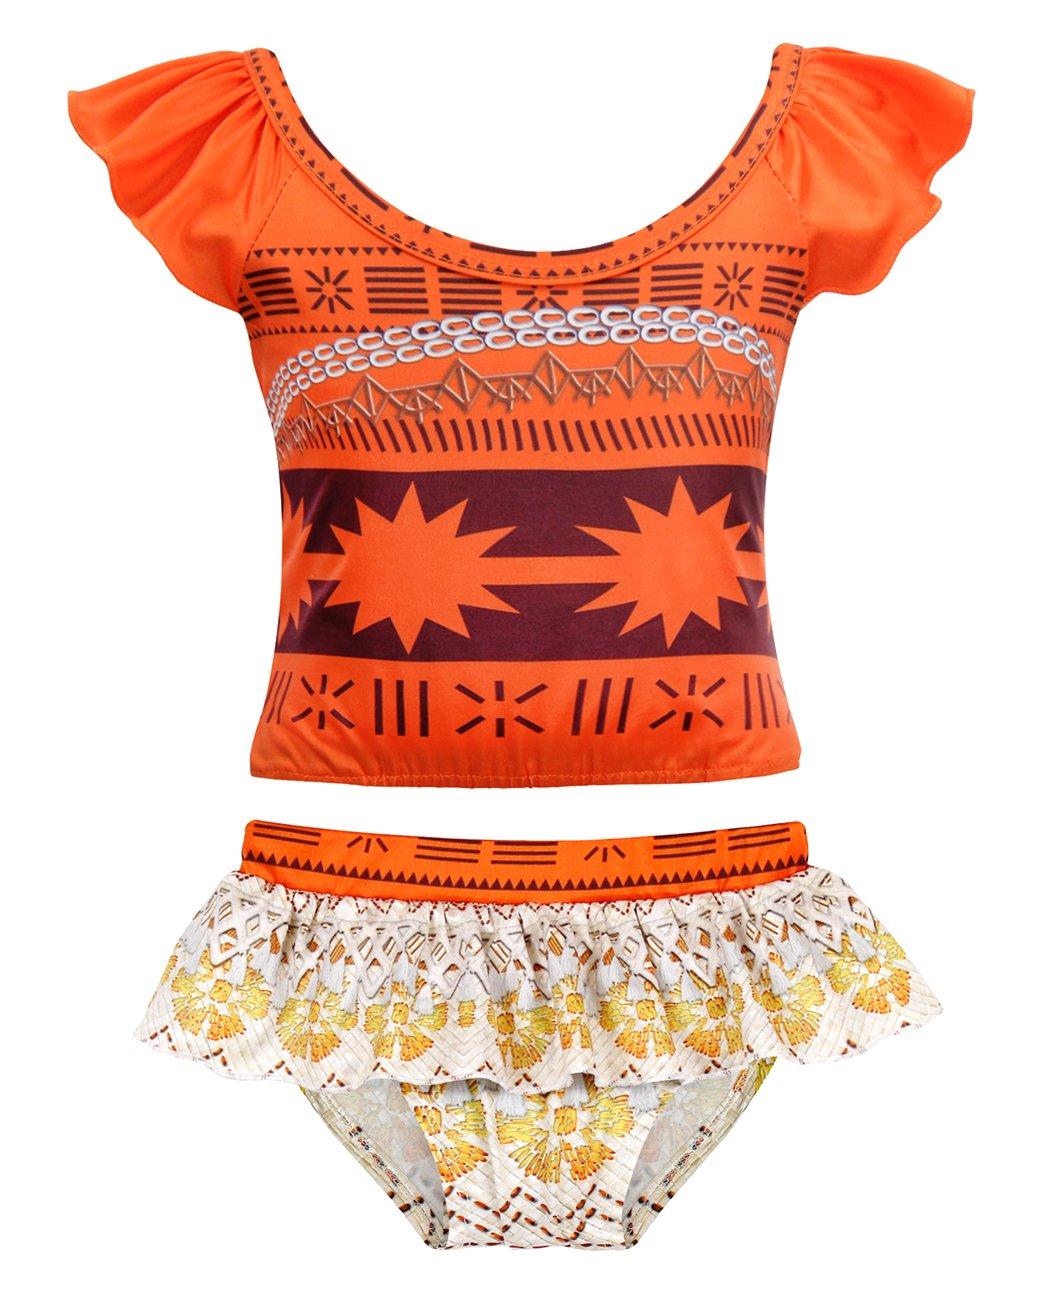 AmzBarley Little Girls Moana 2-Pieces Swimsuit Toddler Swimwear Swimming Suit Age 2-3 Years Size 3T by AmzBarley